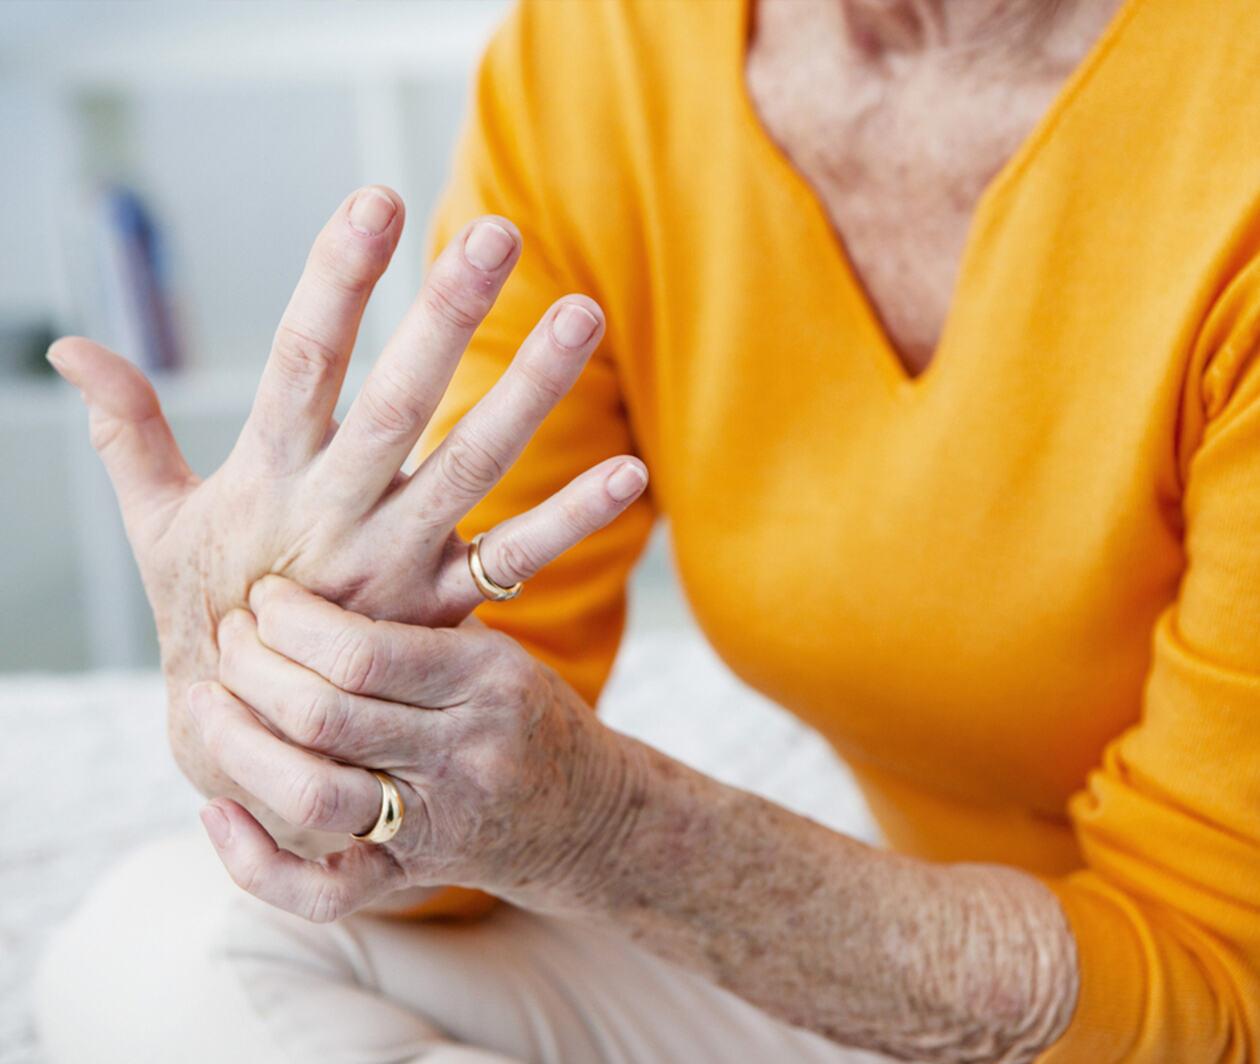 Rheumatoid Arthritis: Exercises for Hands